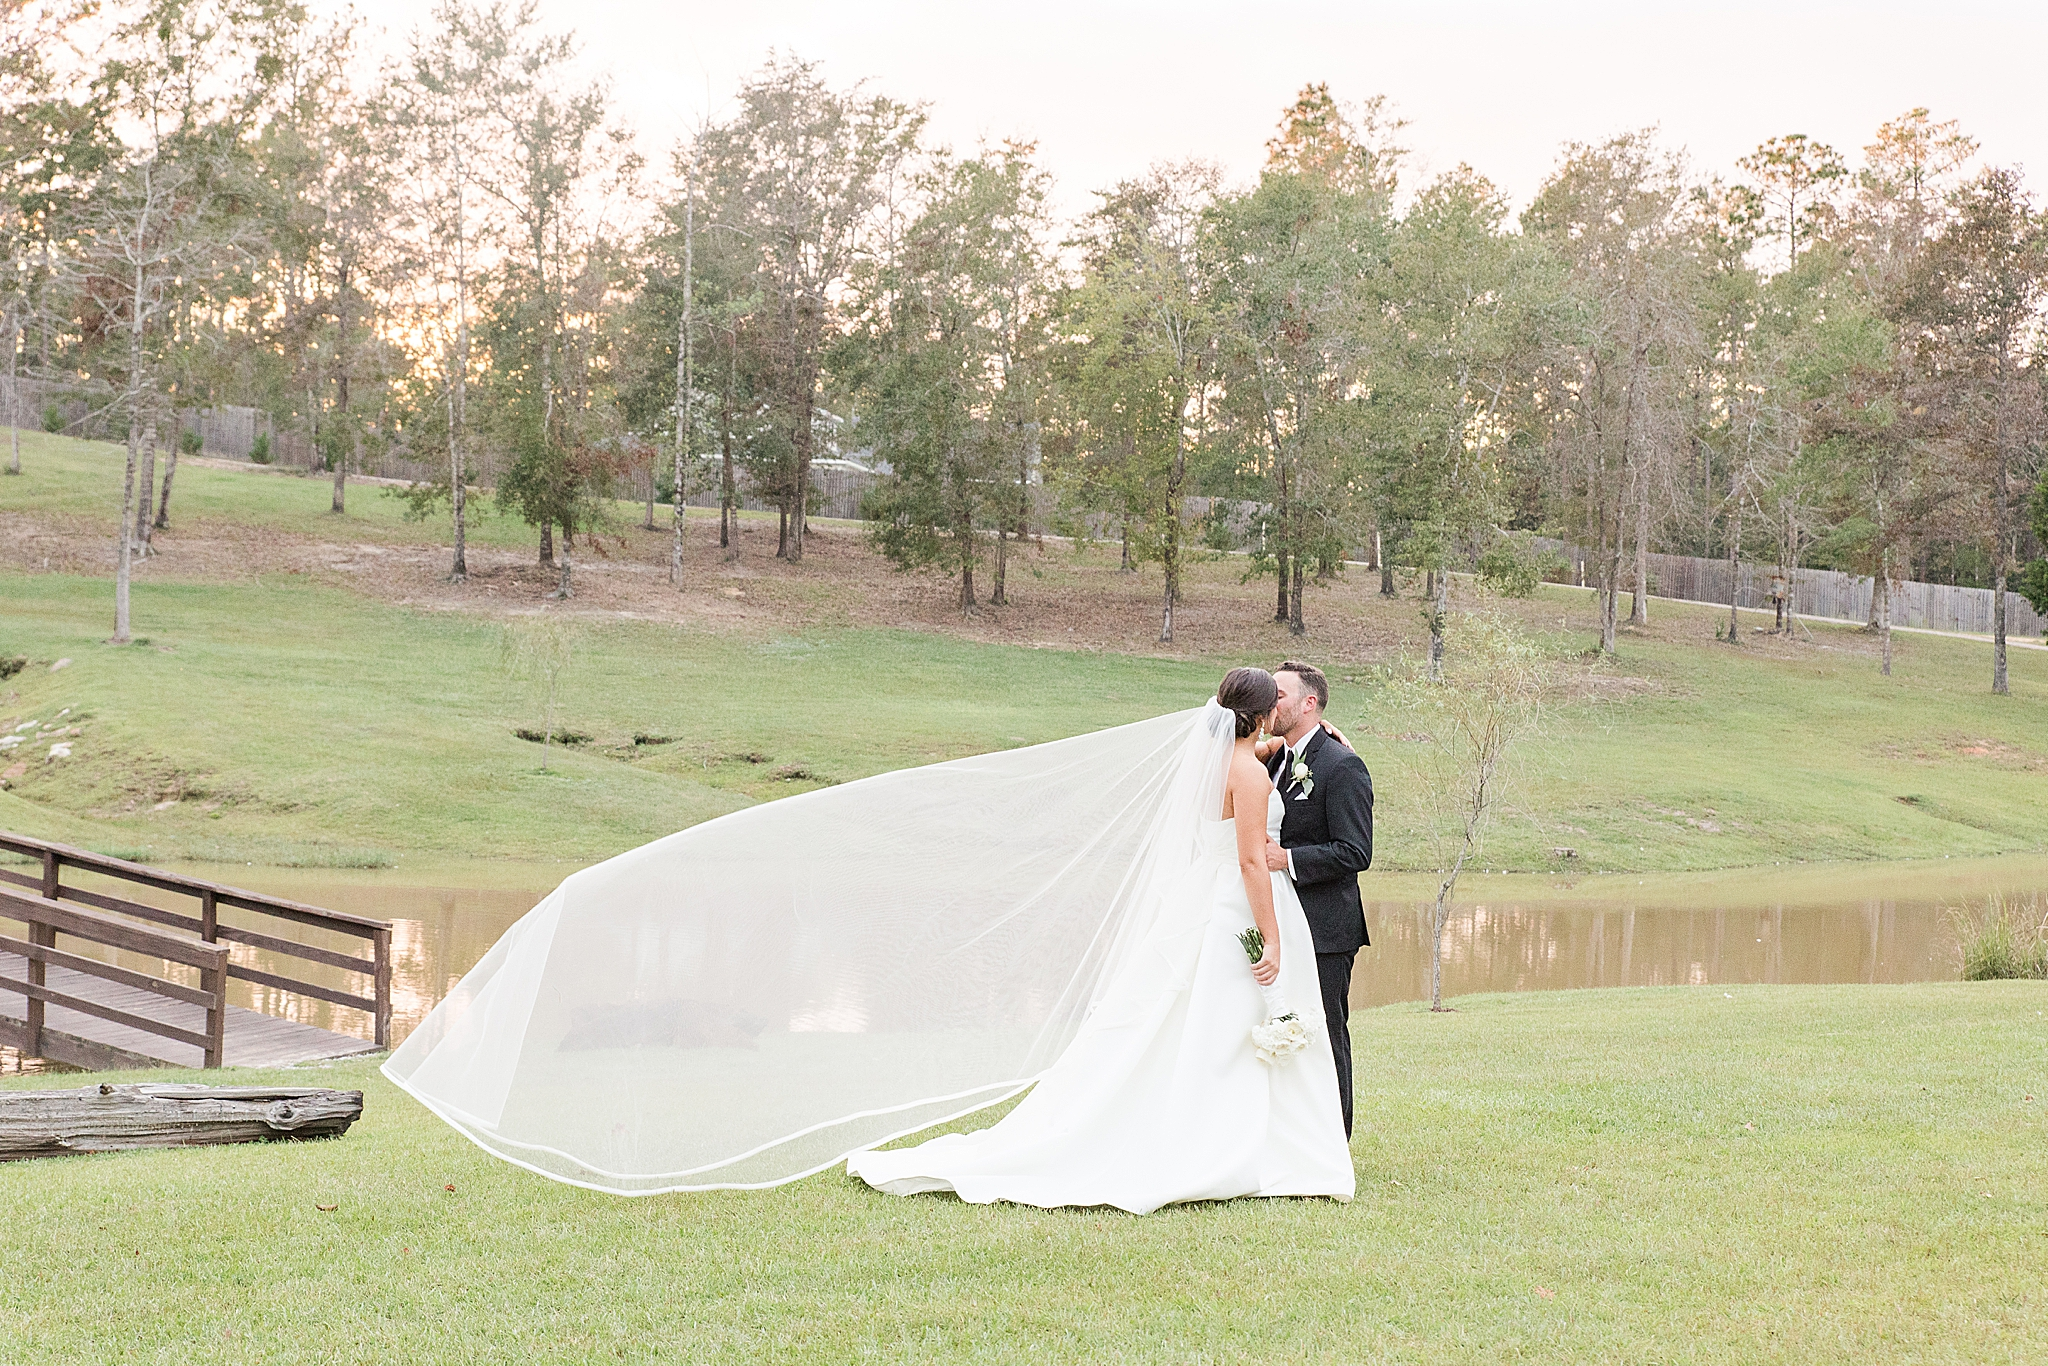 Izenstone wedding portraits at sunset with bride's veil floating